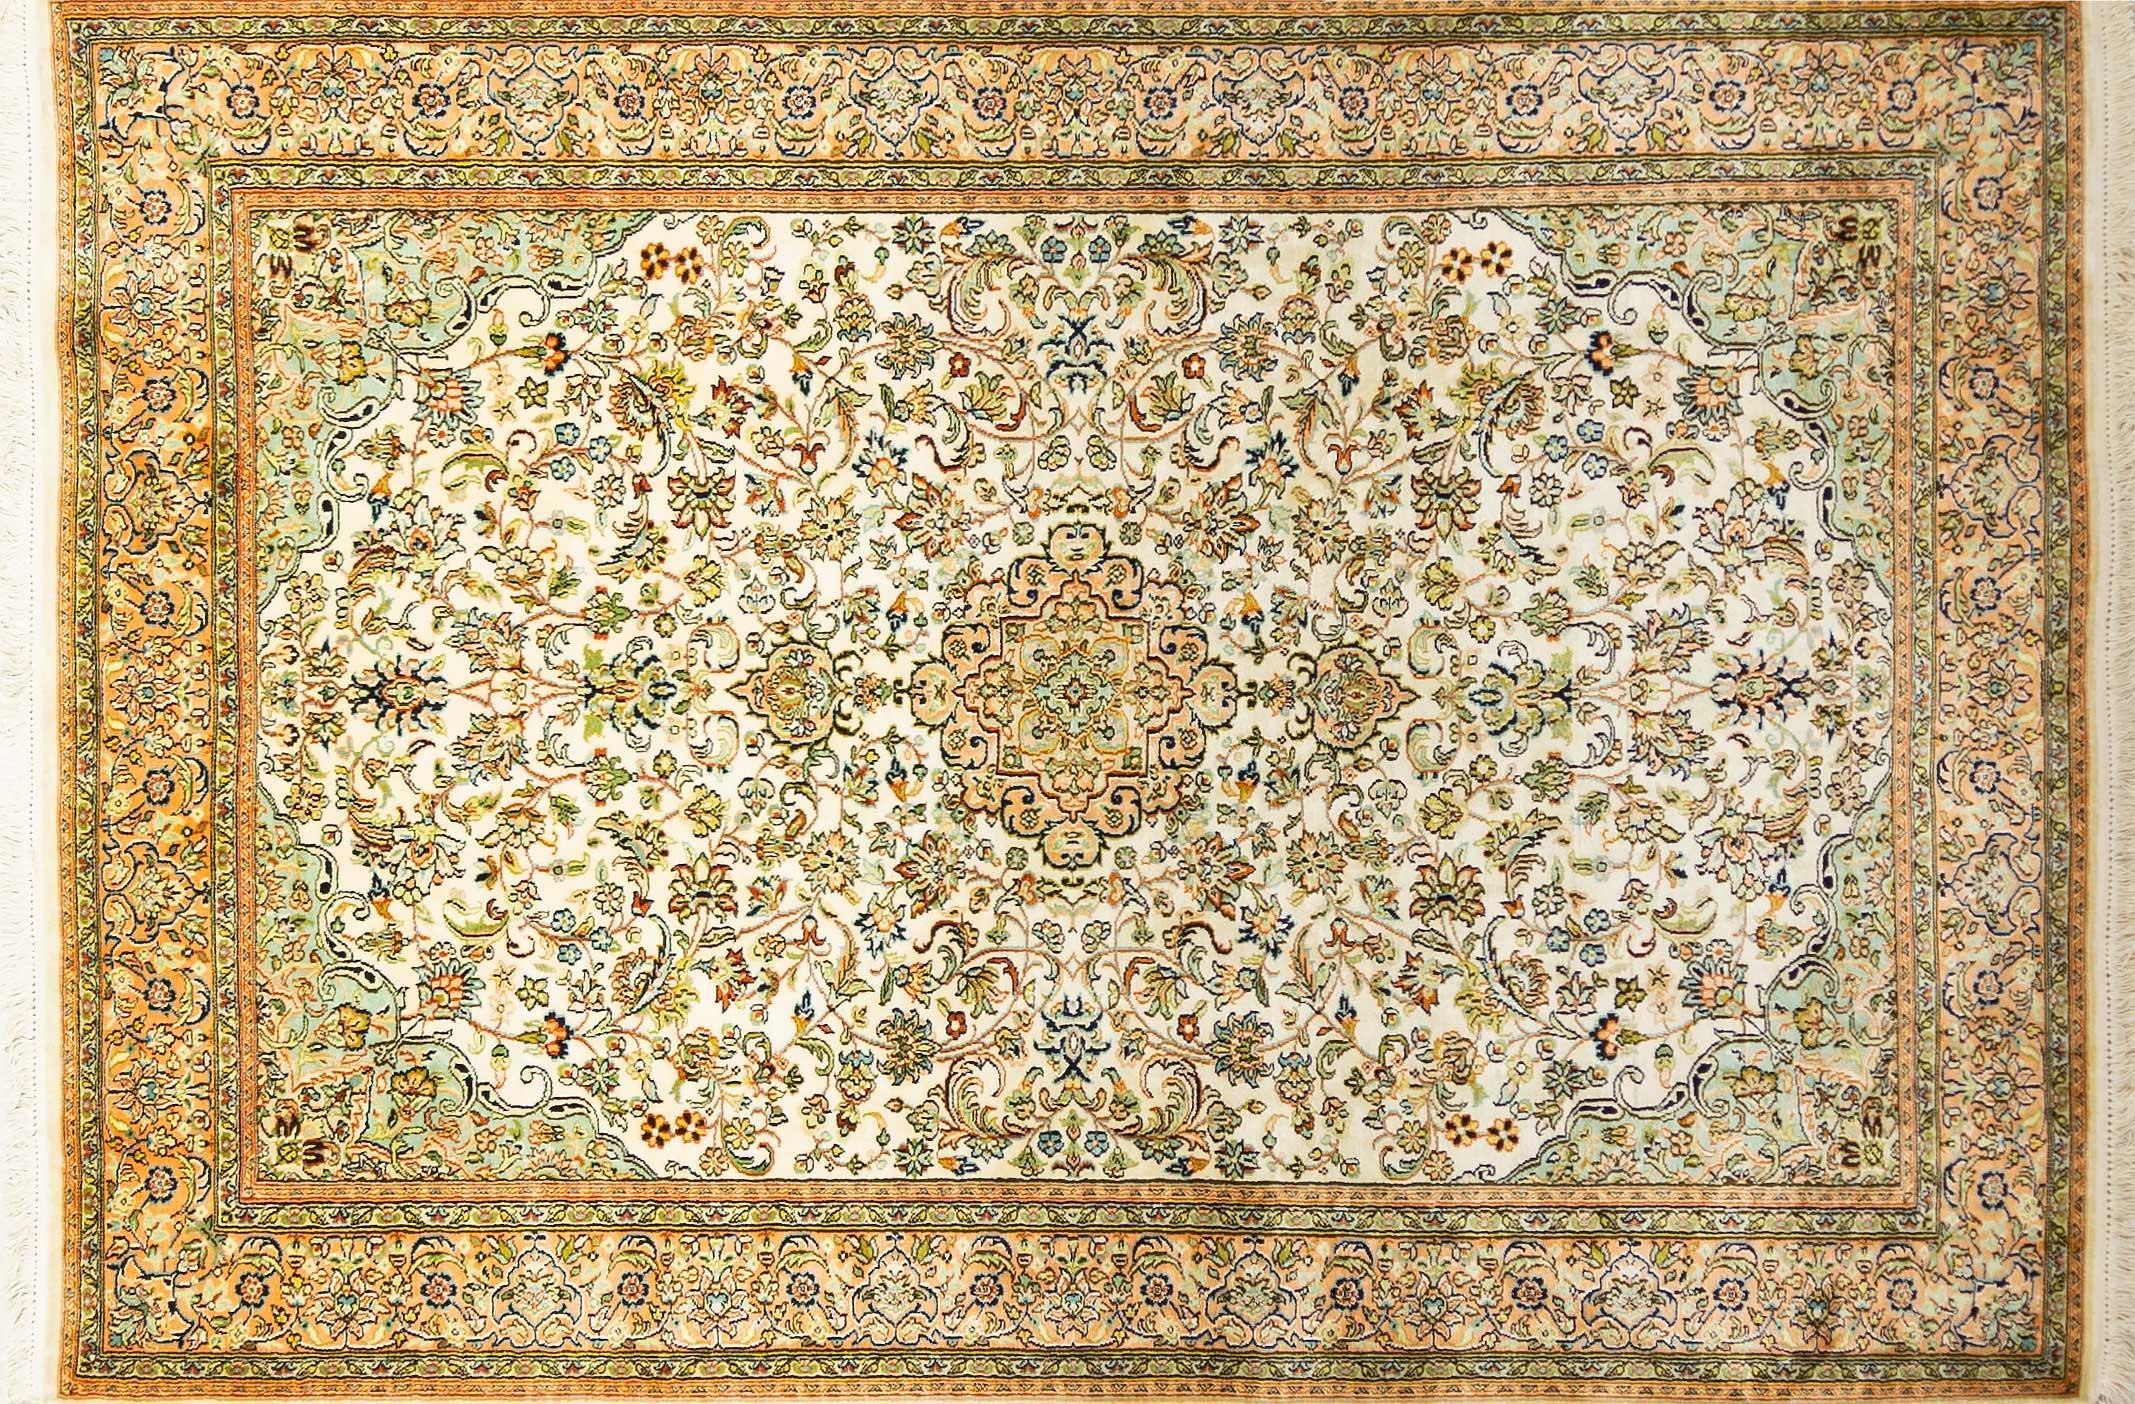 A Hand Knotted Silk Keshmiri Rug, 179 x 125